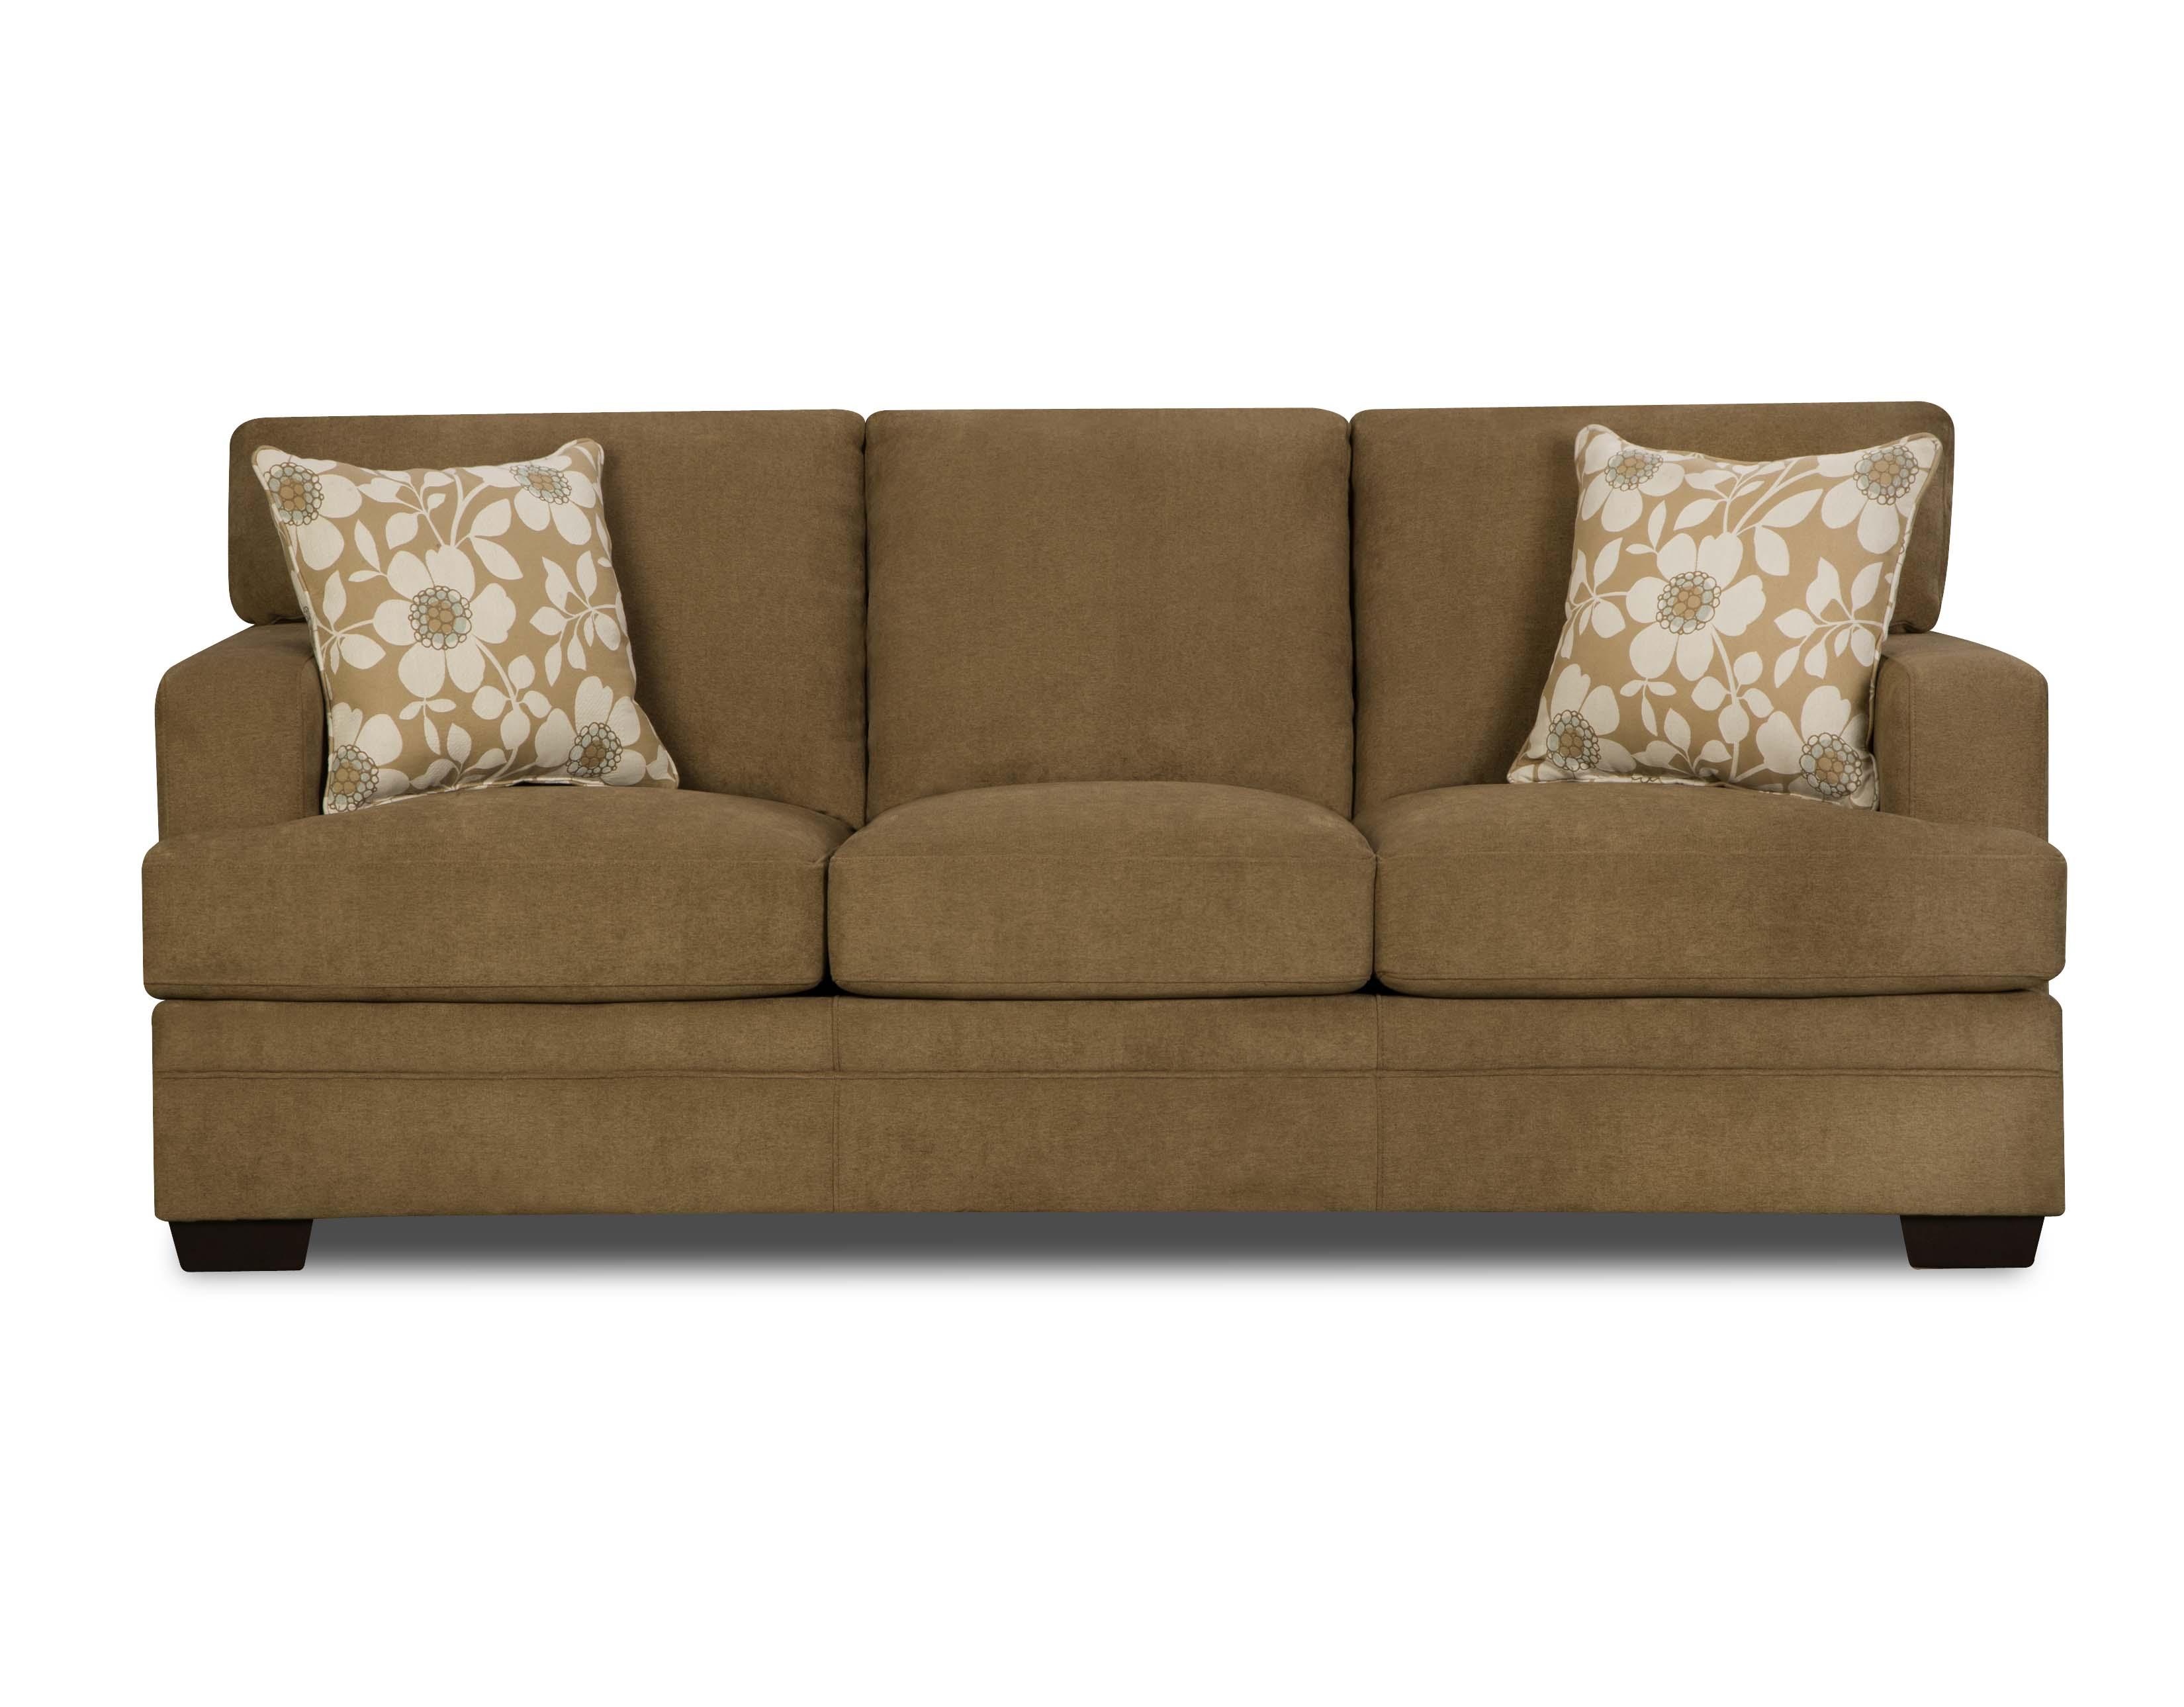 Living room furniture pellis 3 piece living room set truffle